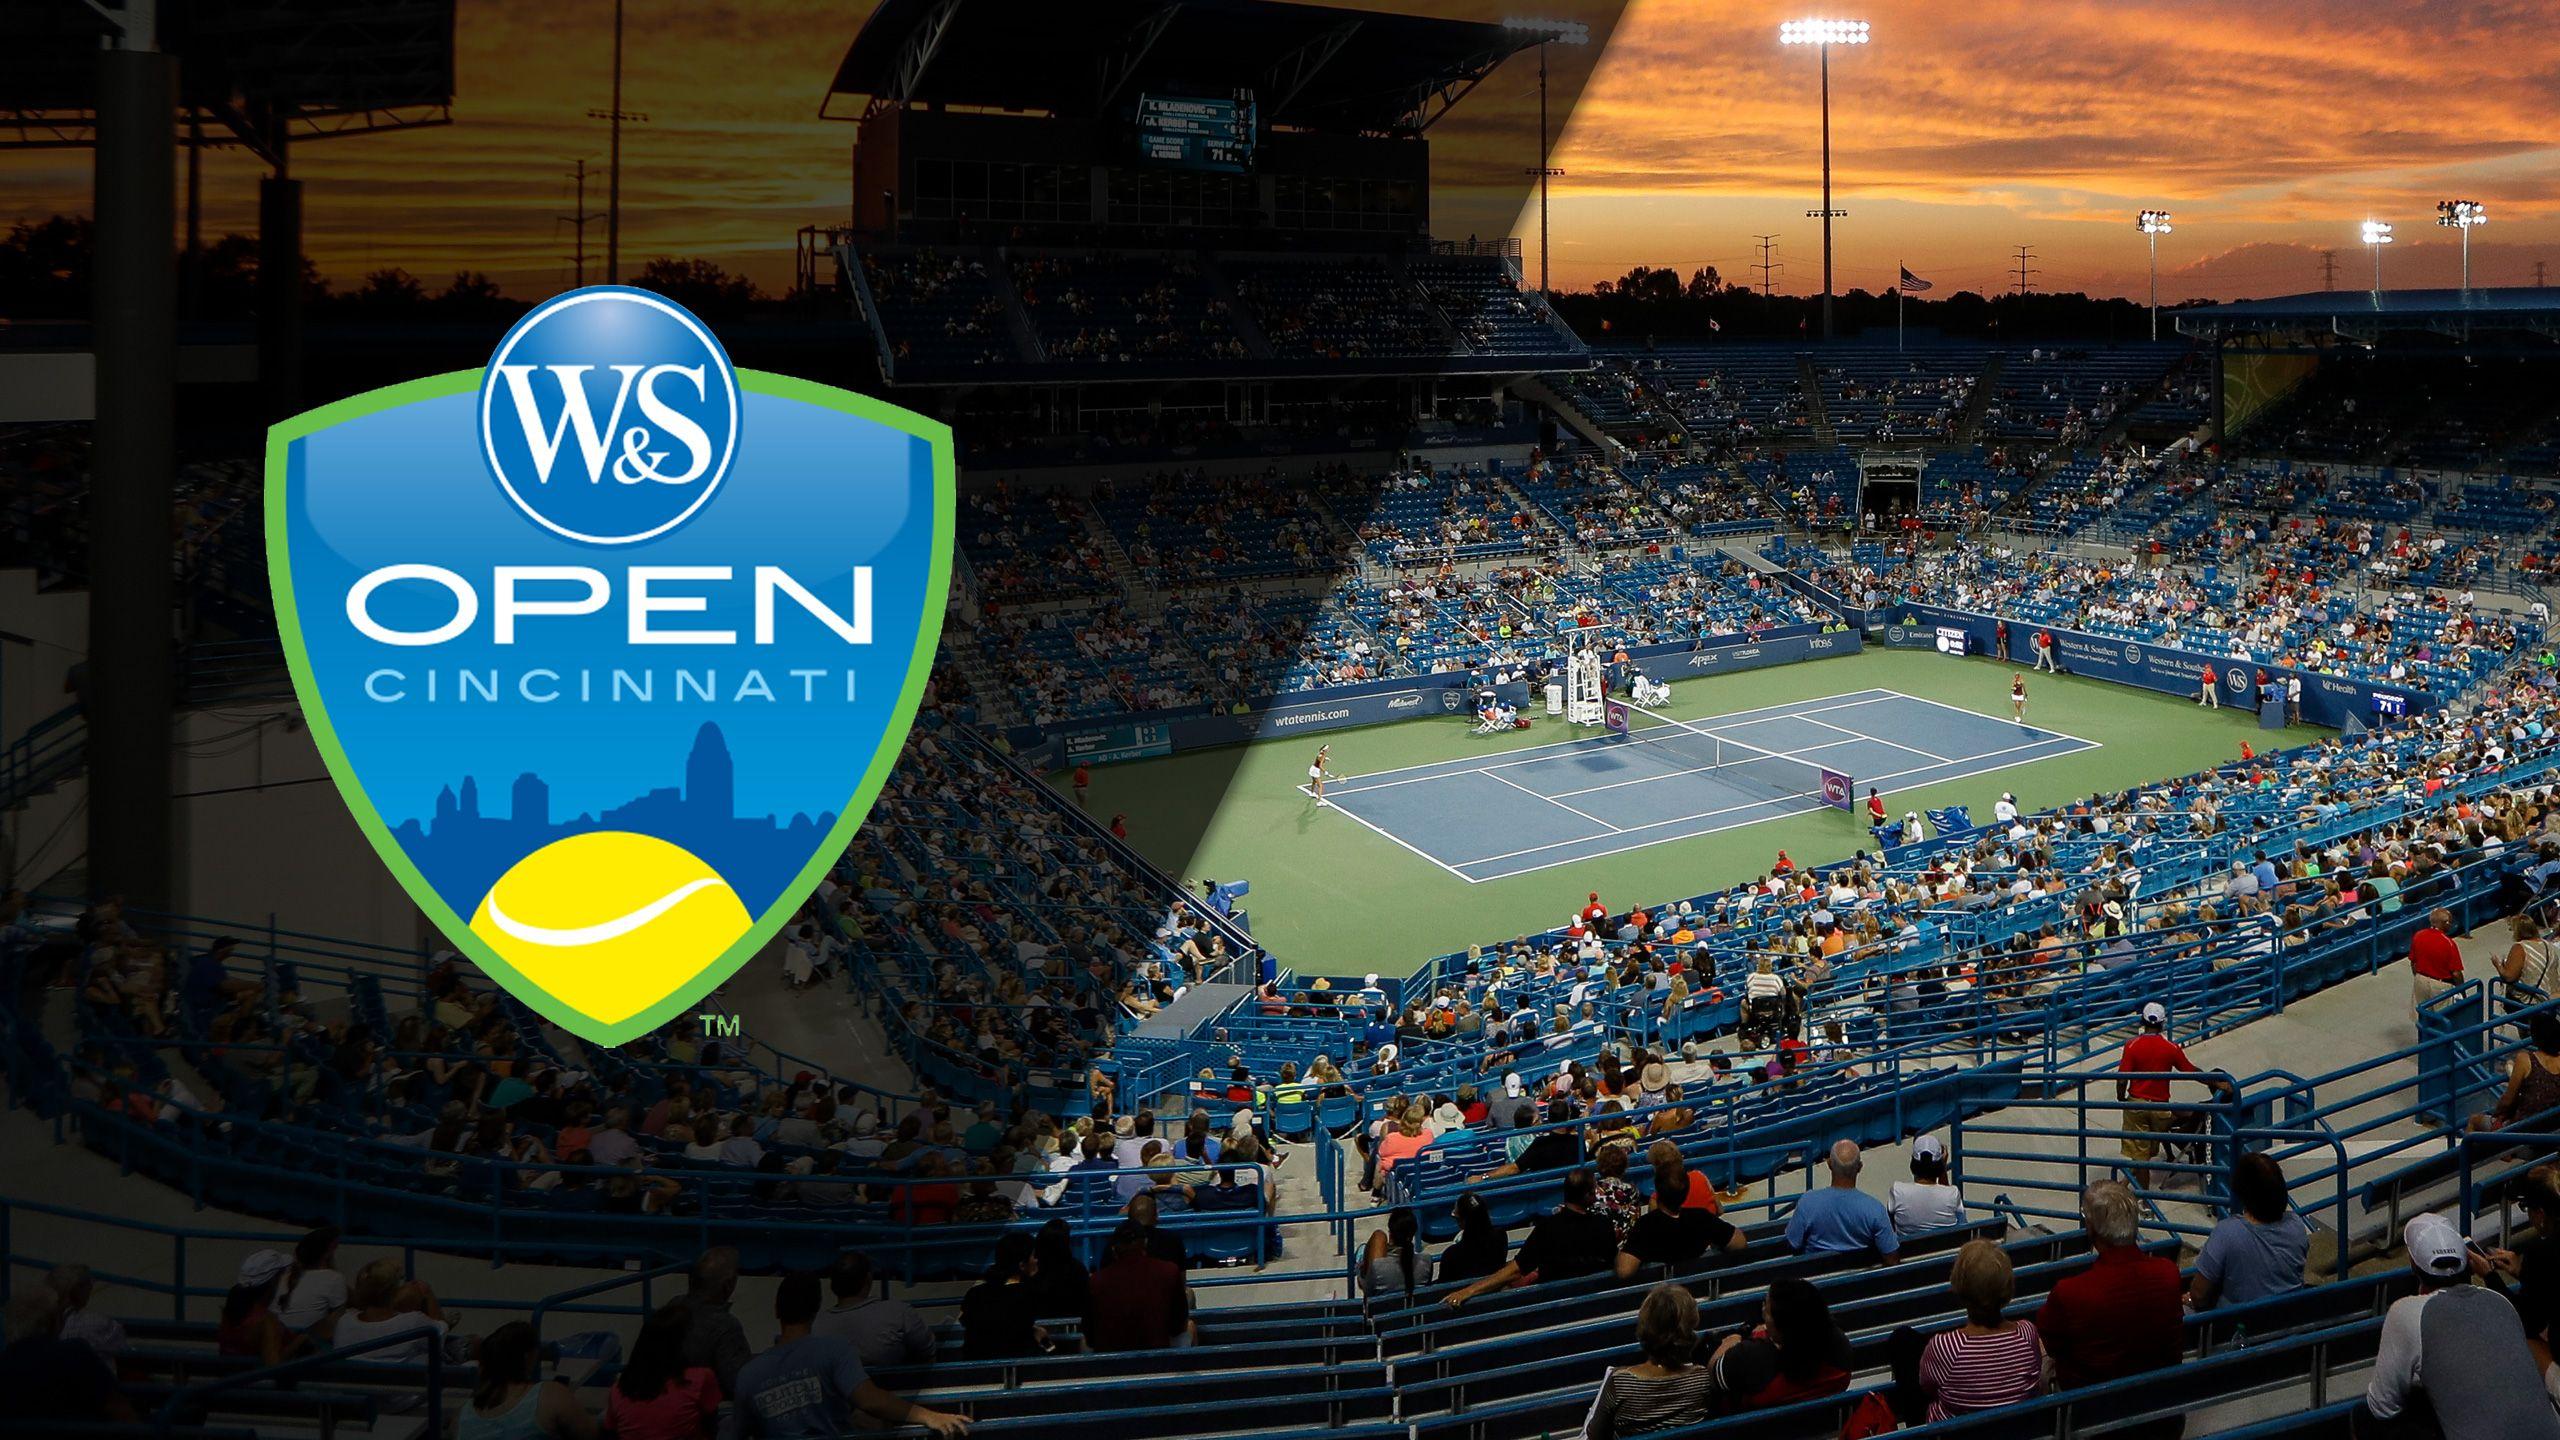 2017 US Open Series - Western & Southern Open (Men's & Women's Semifinals)